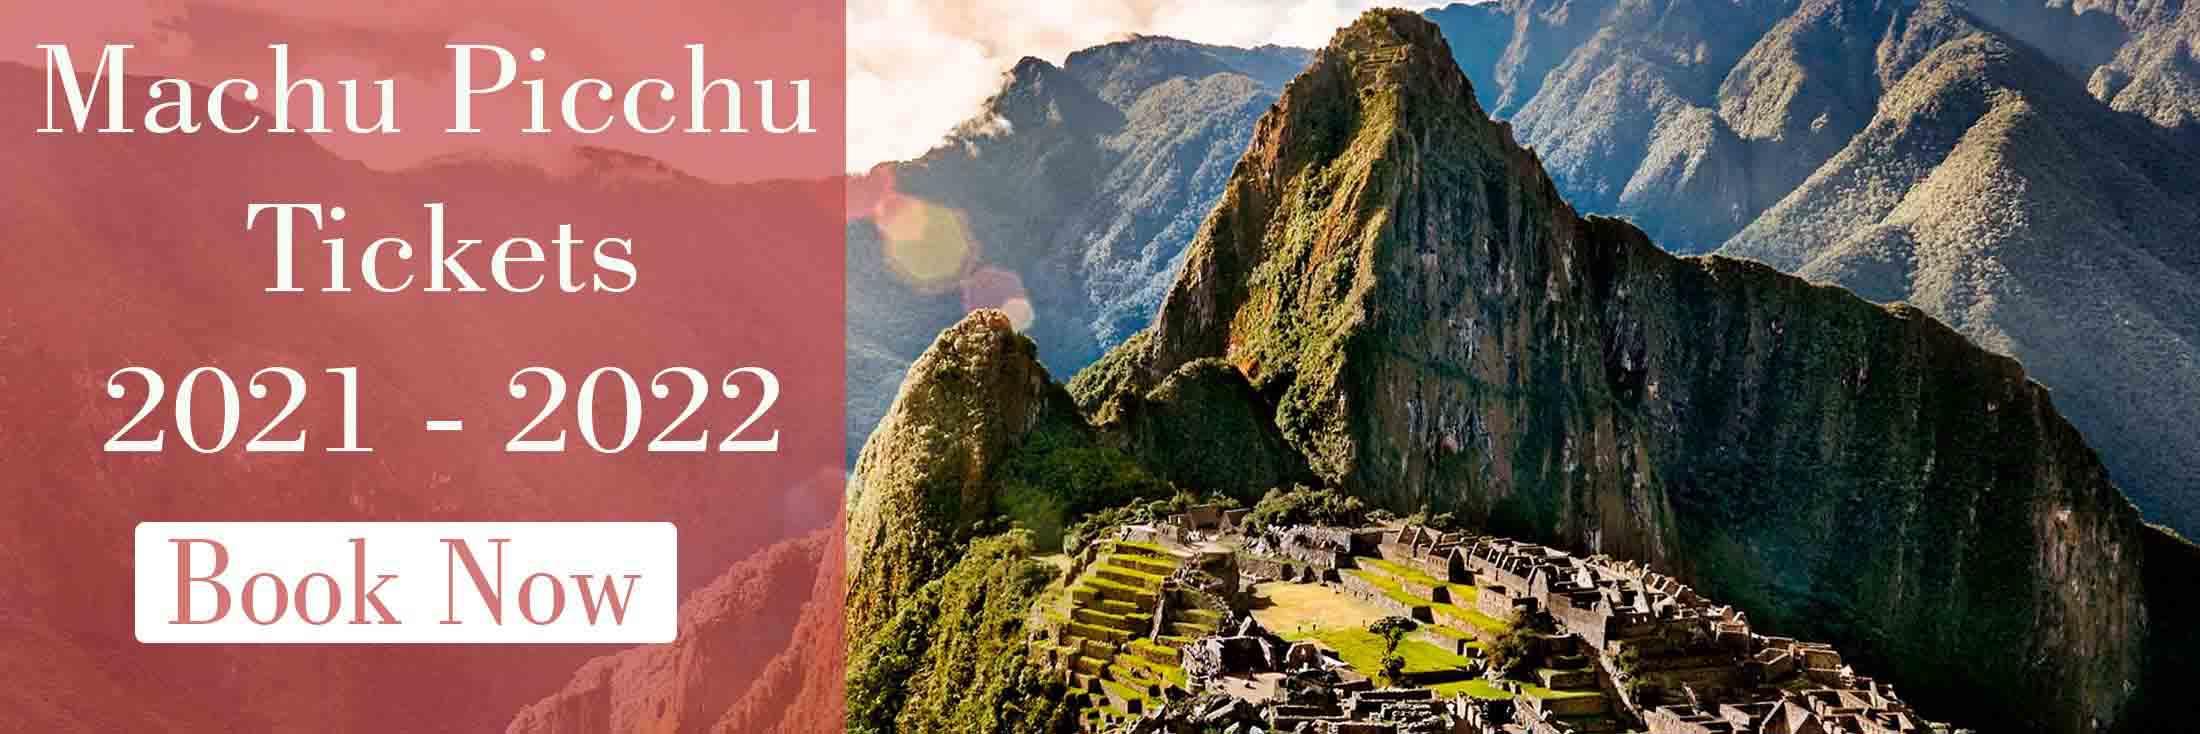 Machu Picchu tickets 2021